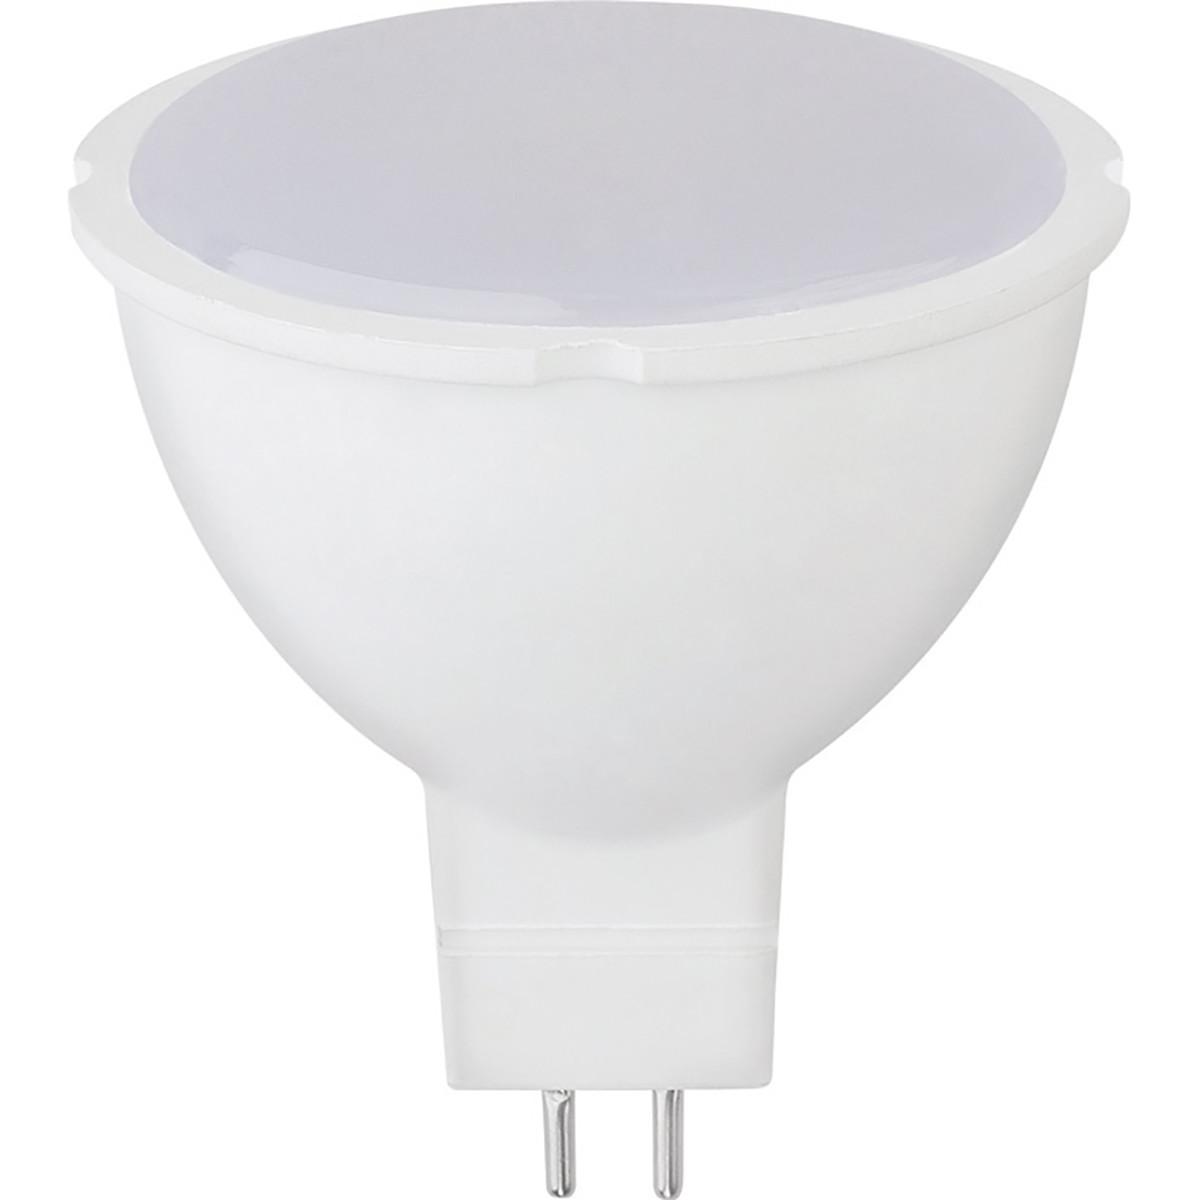 LED Spot - Fona - GU5.3 Fitting - 4W - Helder/Koud Wit 6400K - 230V